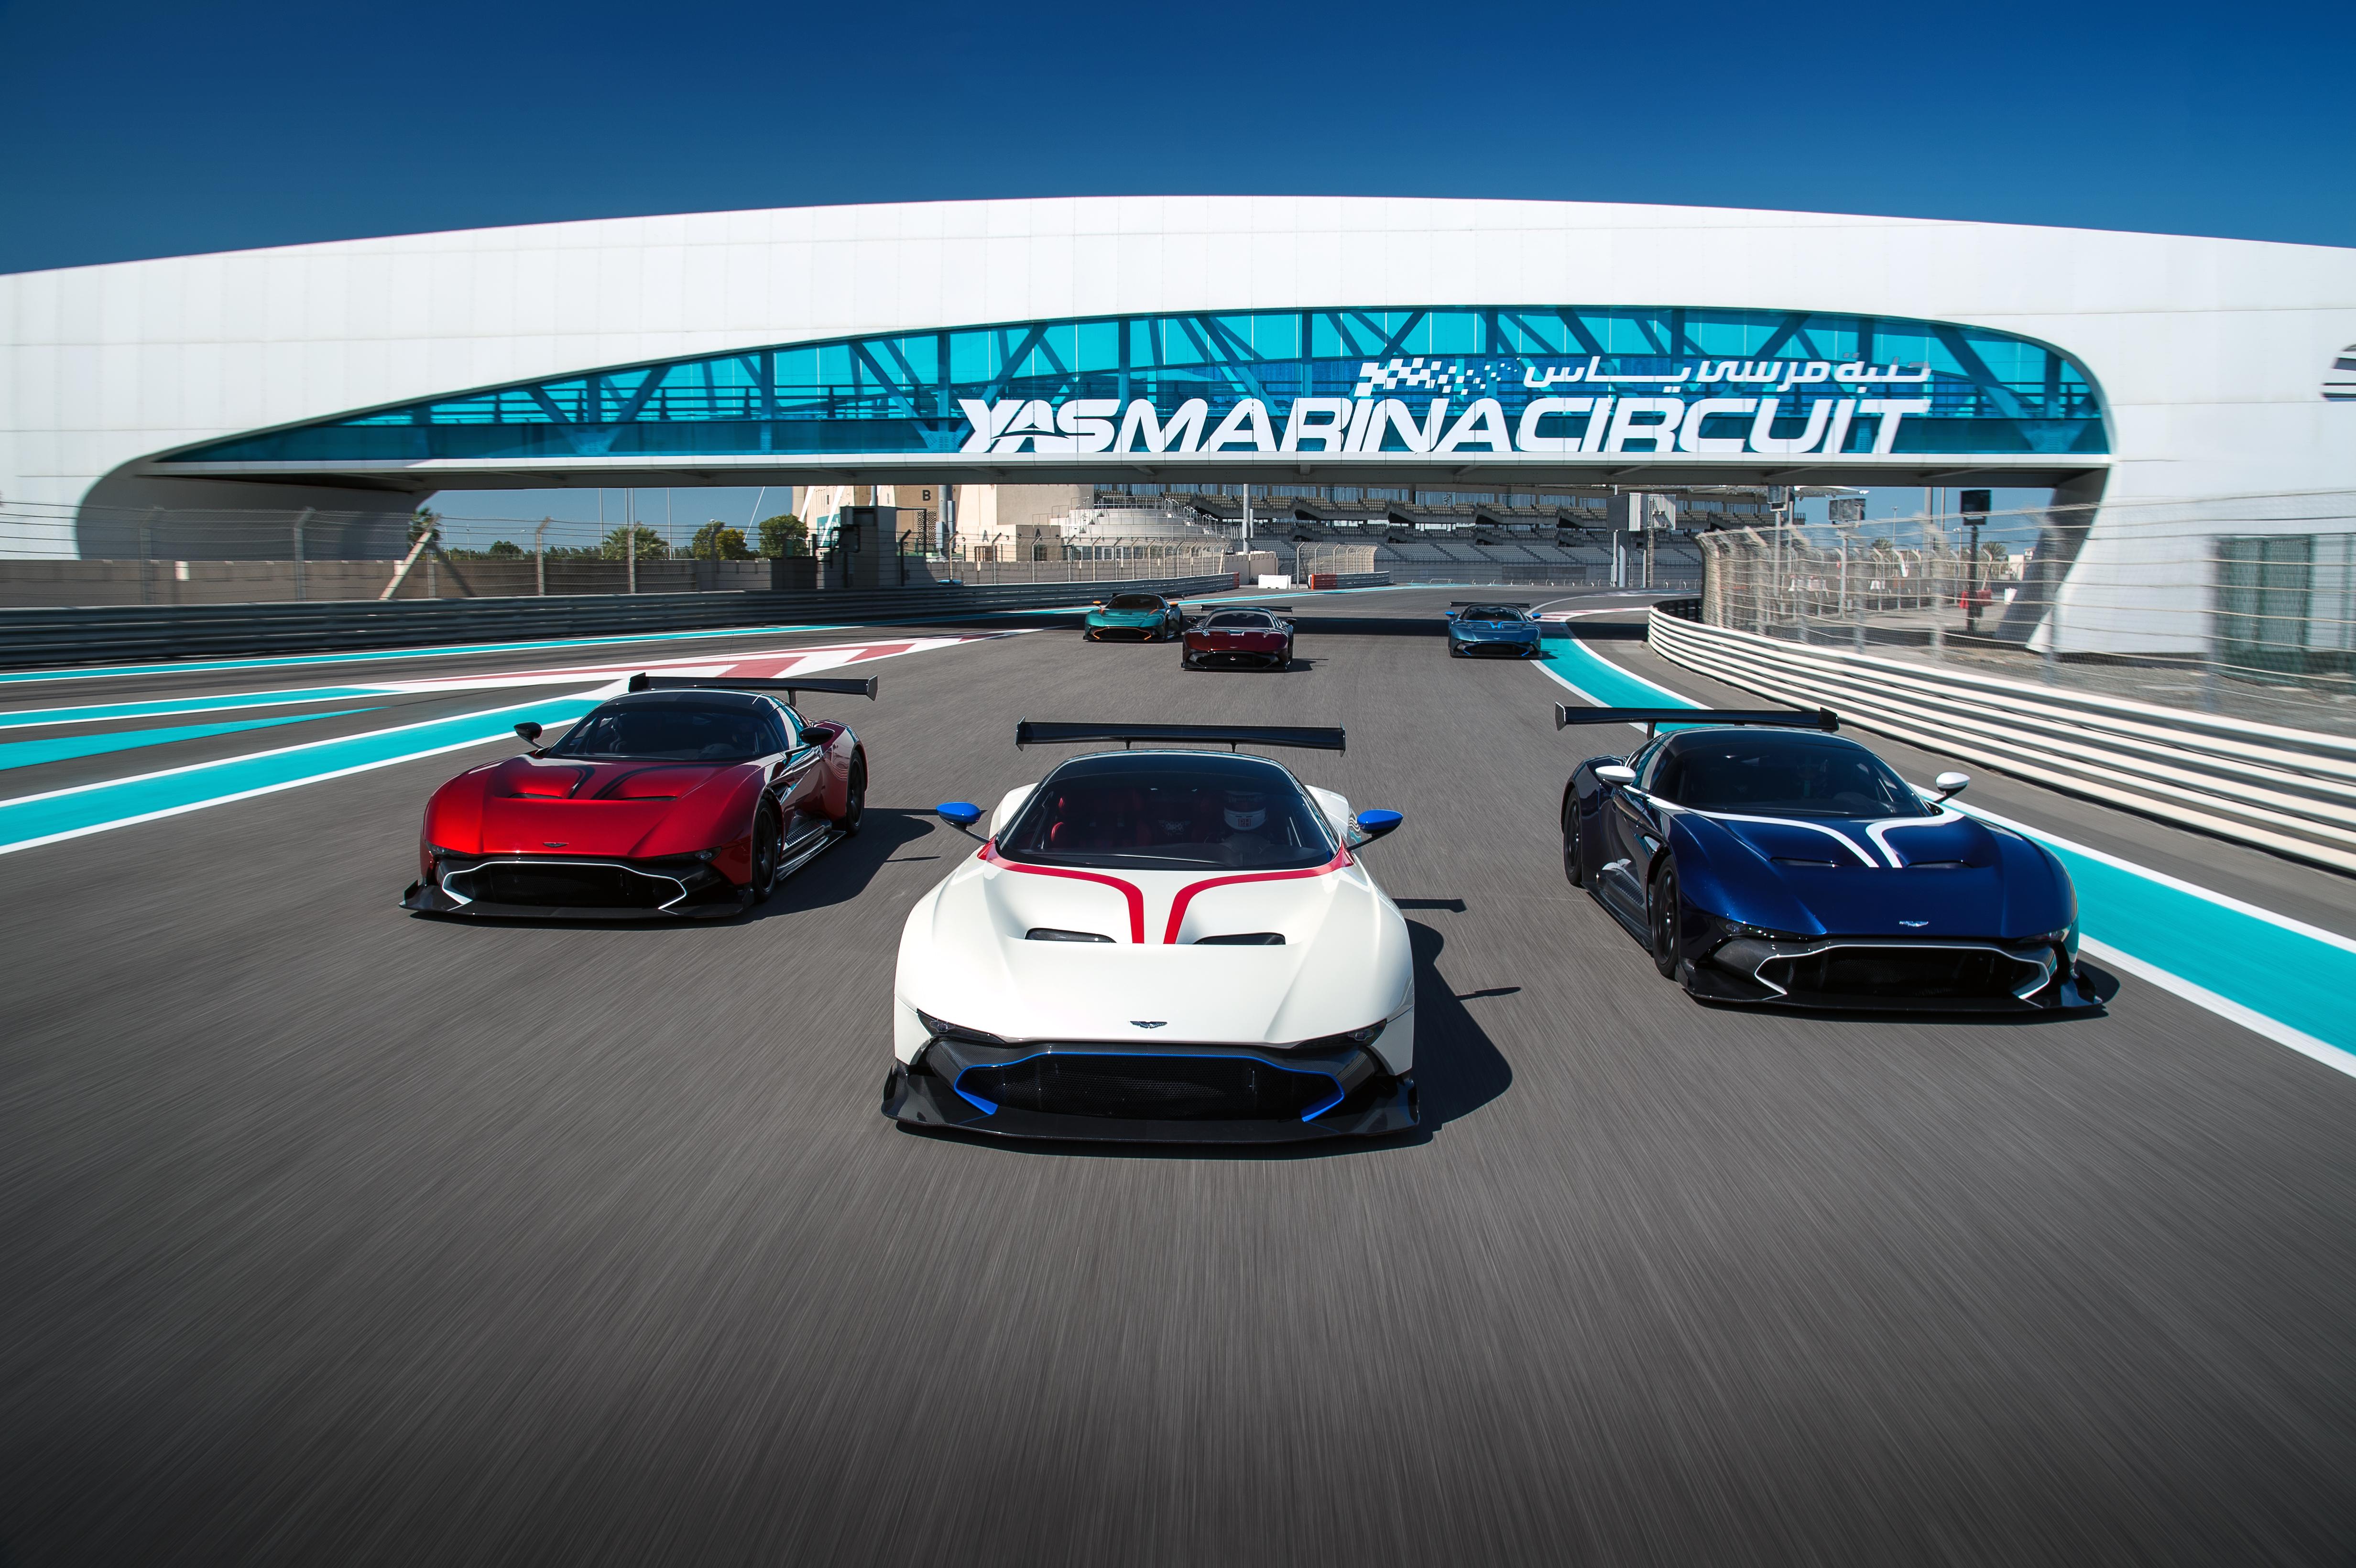 aston martin vulcan: new owners go through racing school